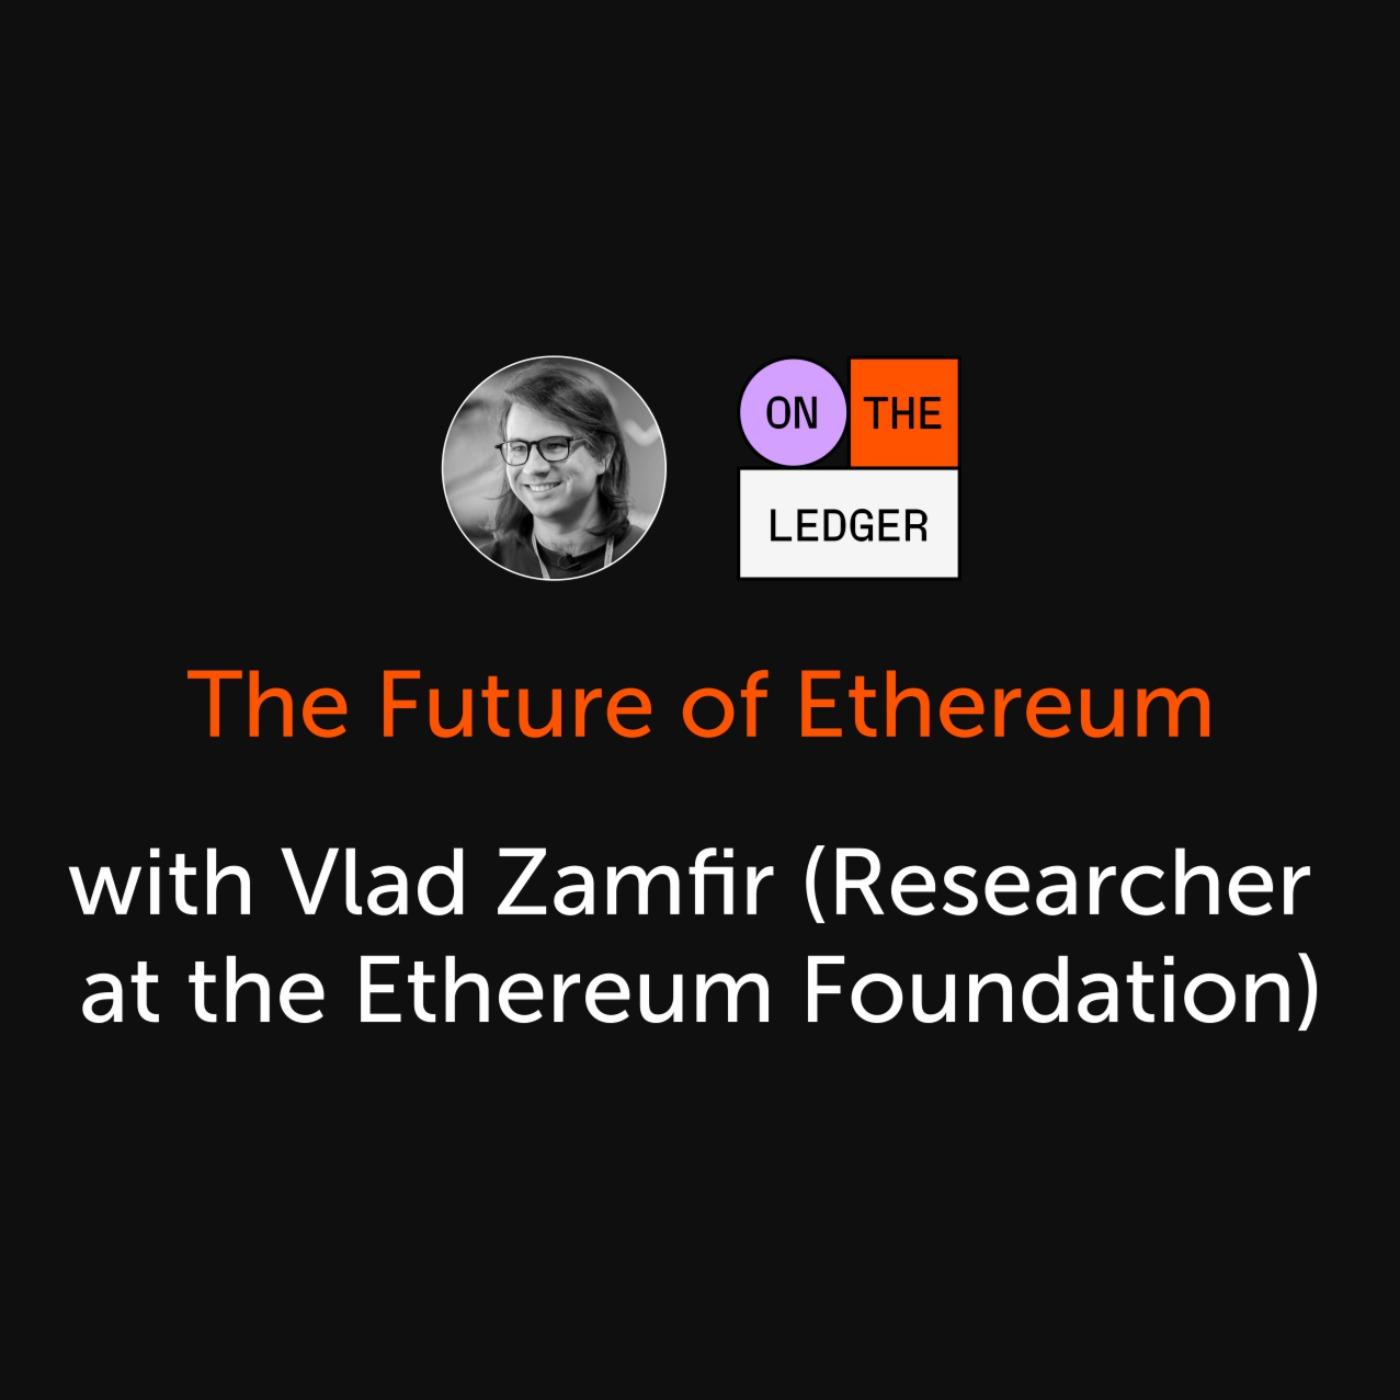 #5 The Future of Ethereum w/ Vlad Zamfir